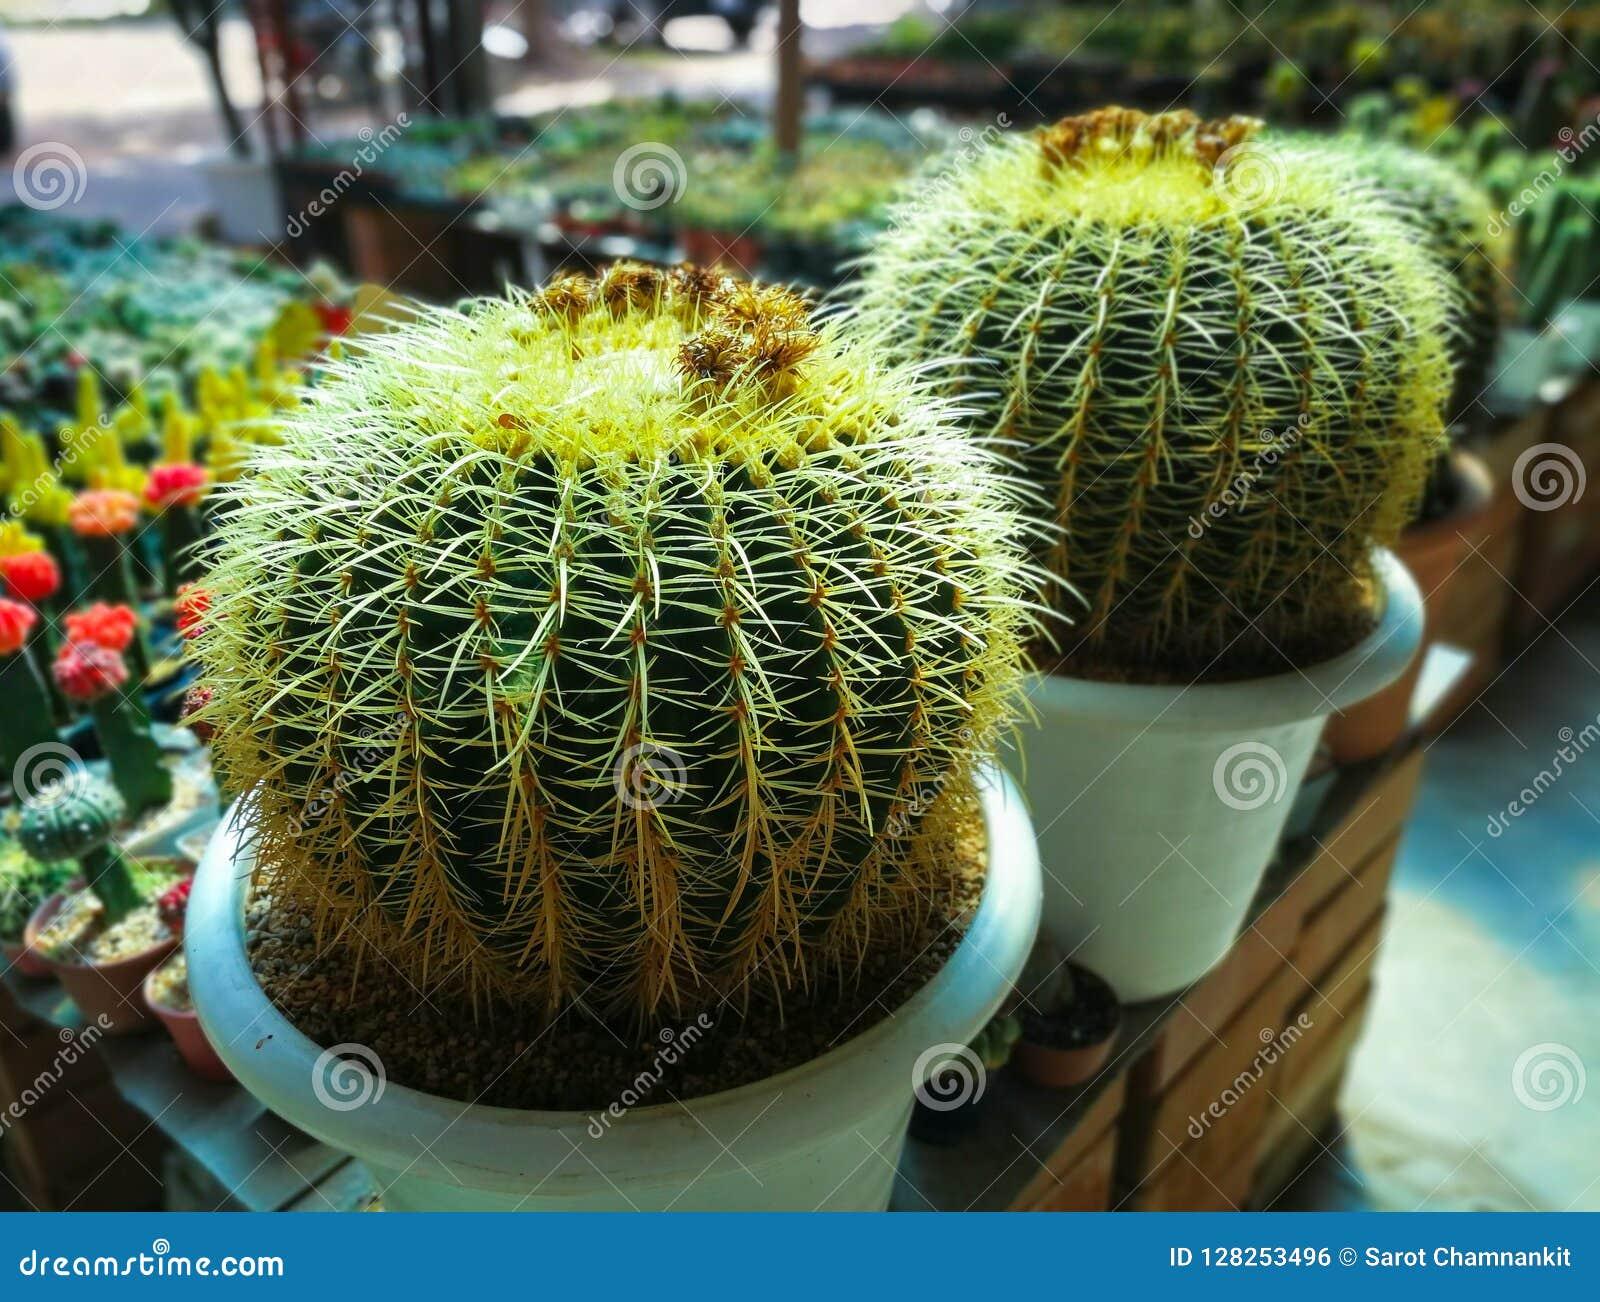 Golden Barrel Cactus.